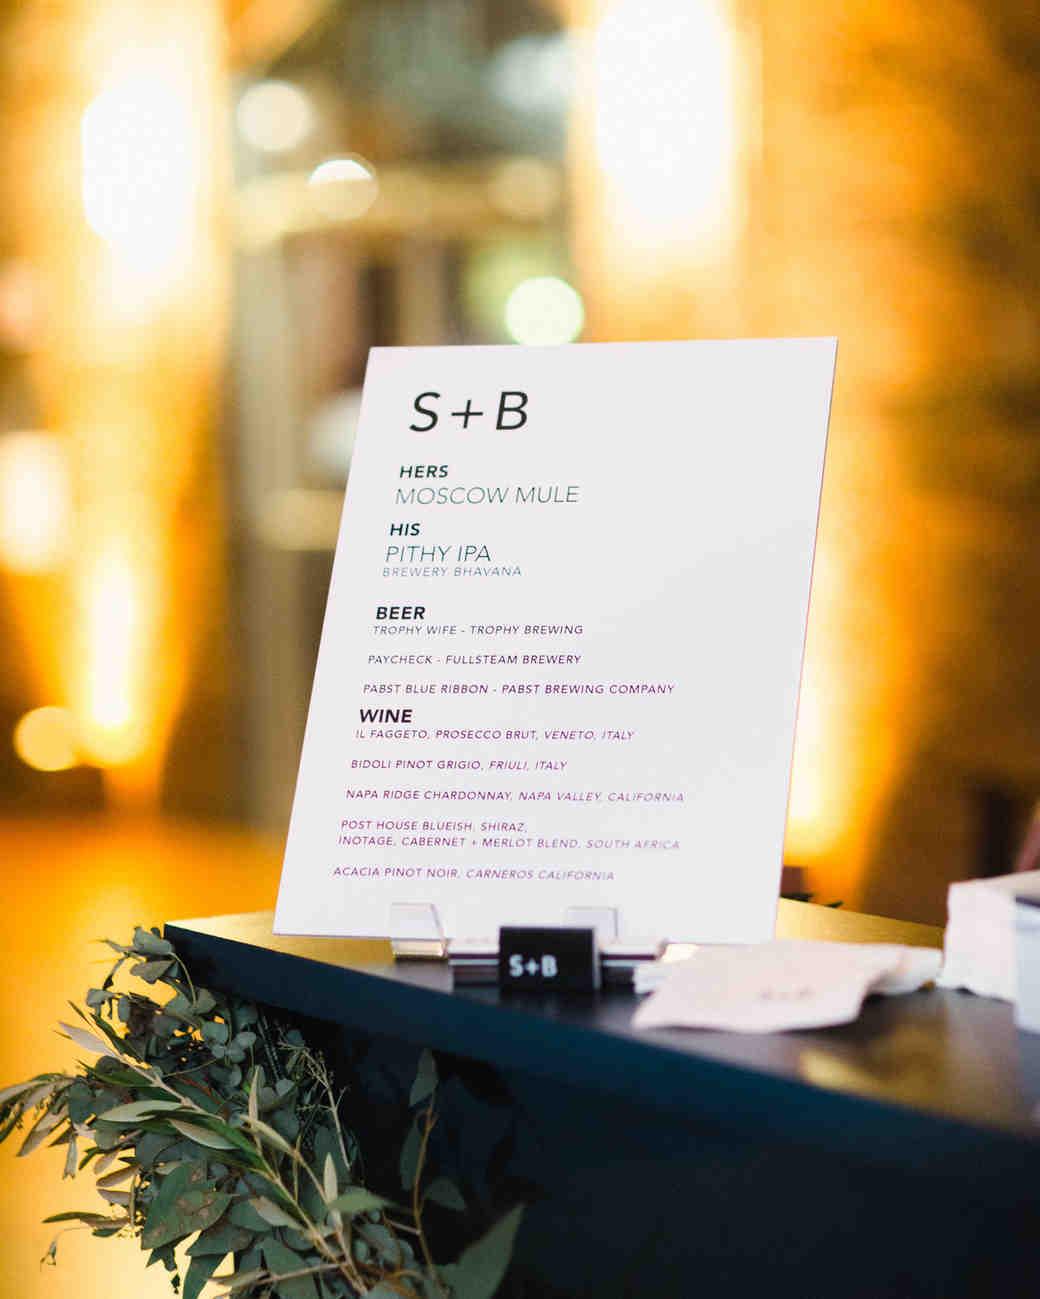 wedding food and spirits menu on display